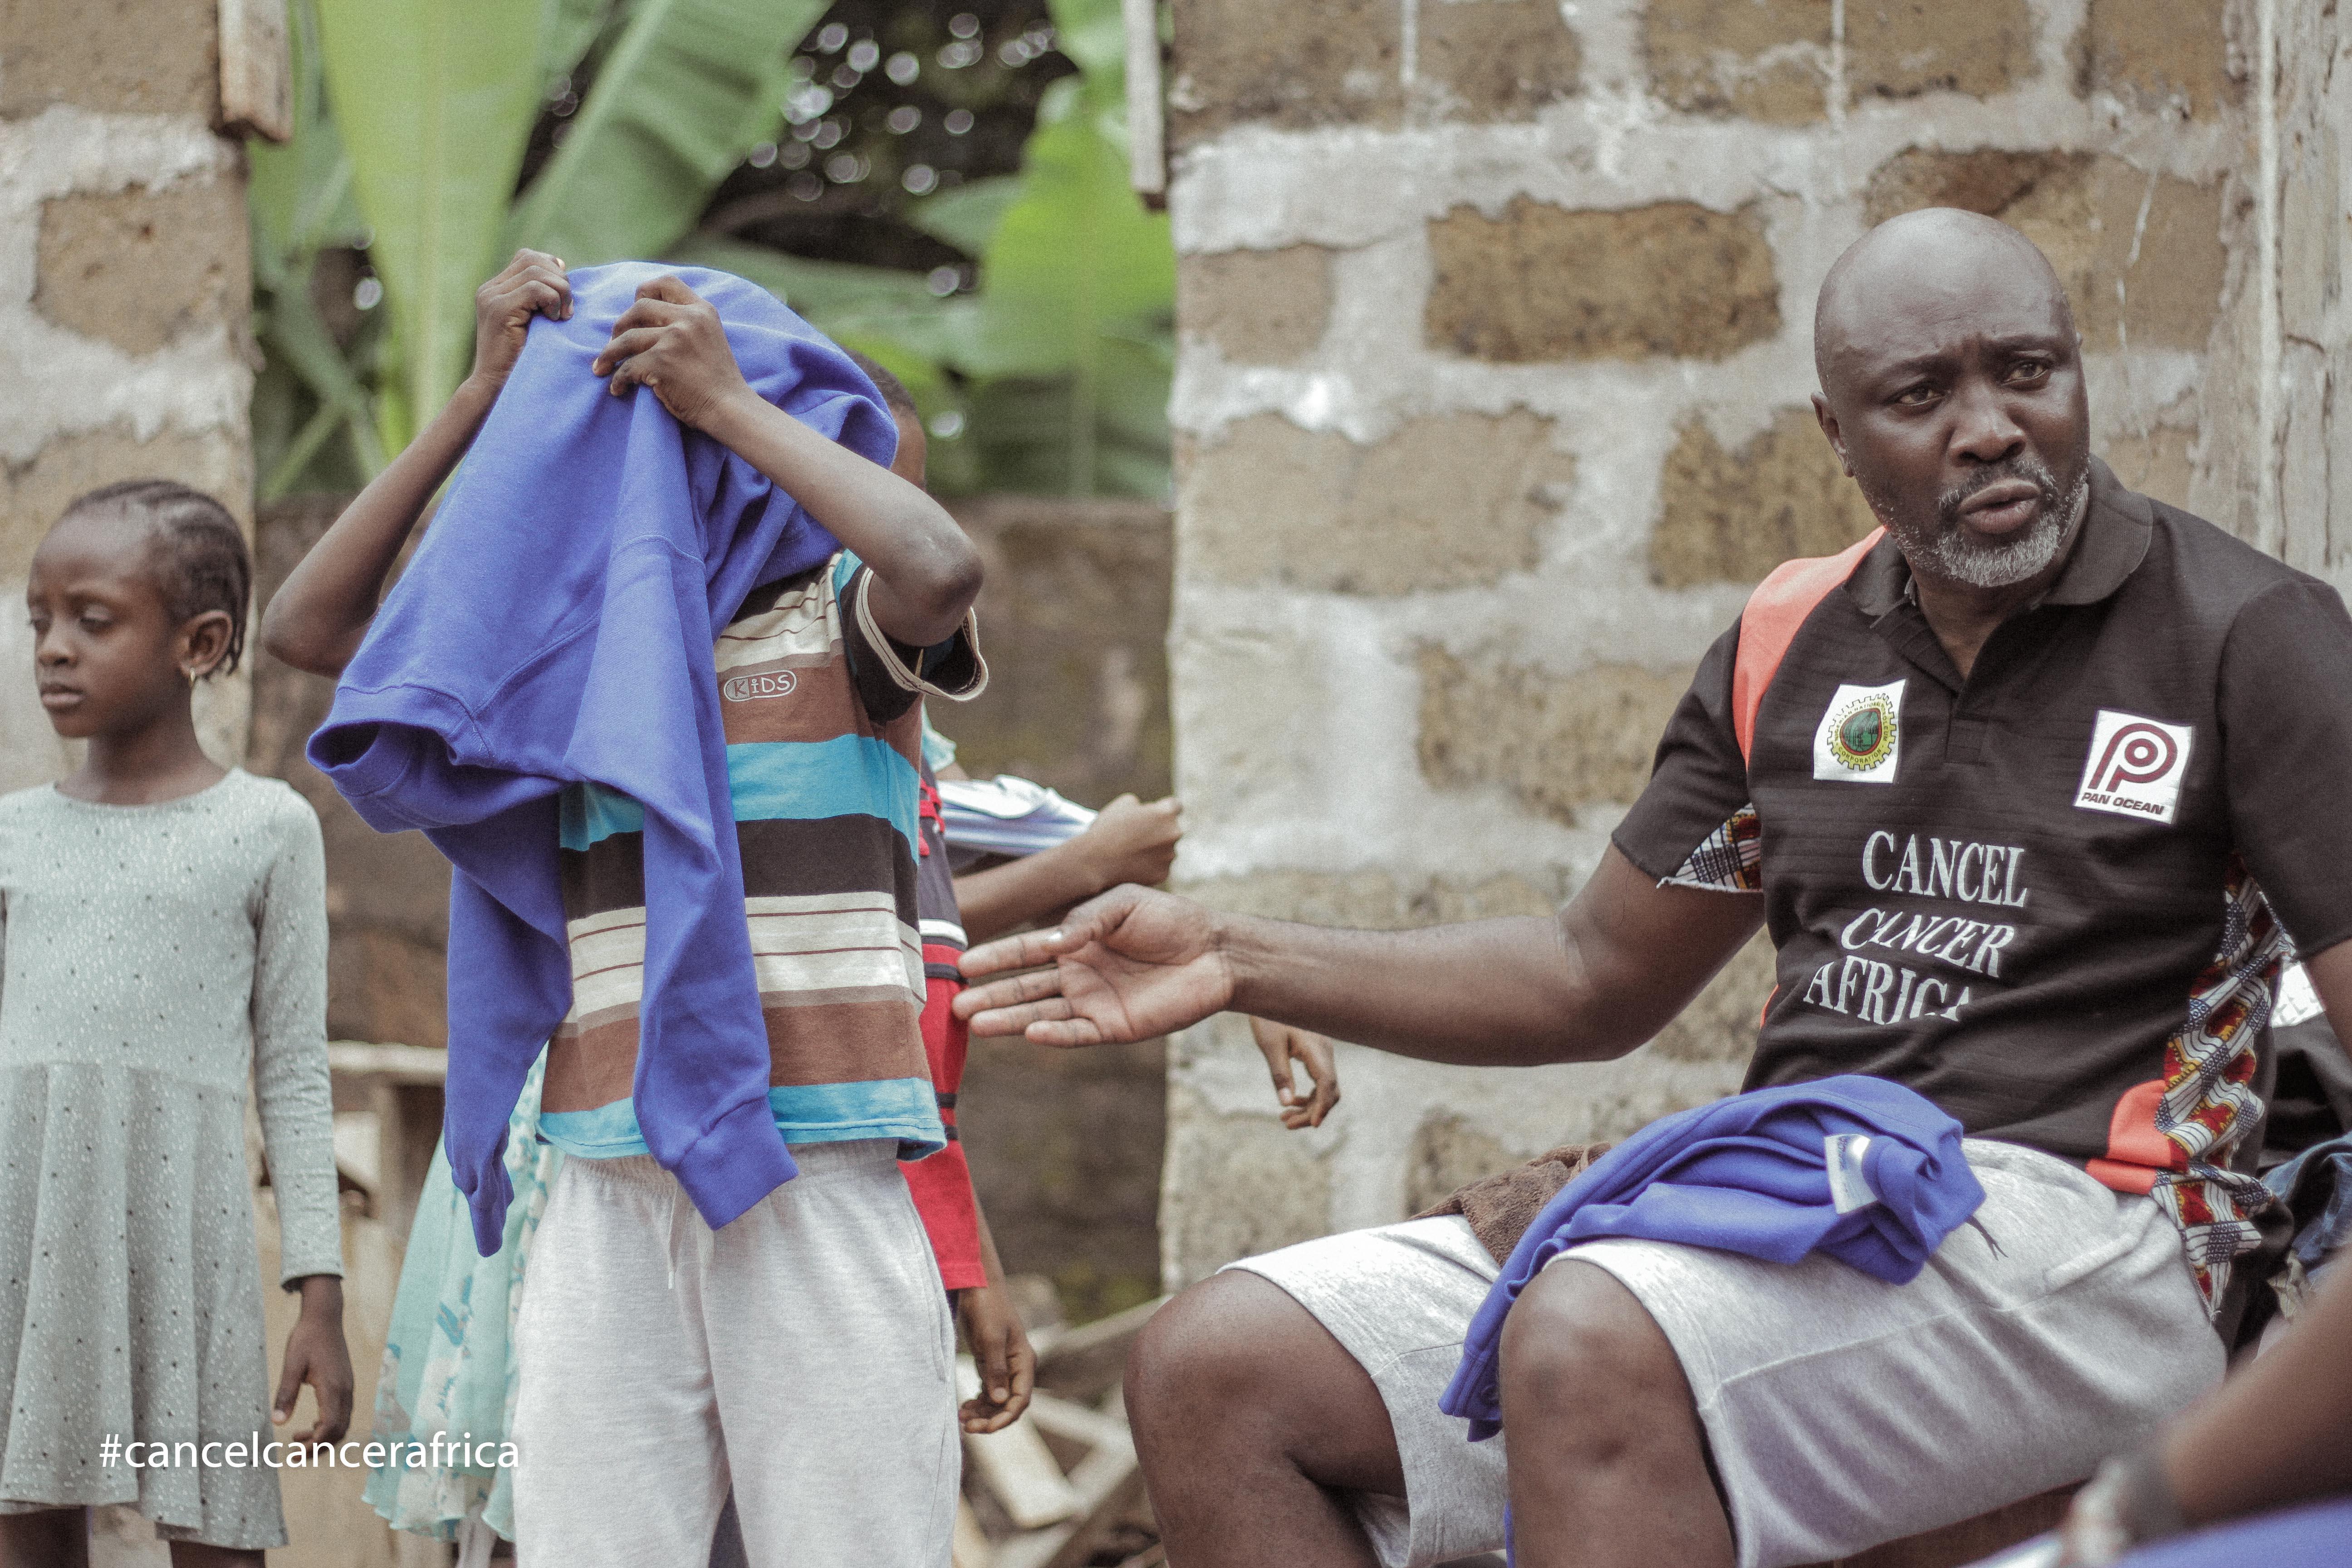 Cancel Cancer Africa celebrating with Kids in rural Nigeria (10